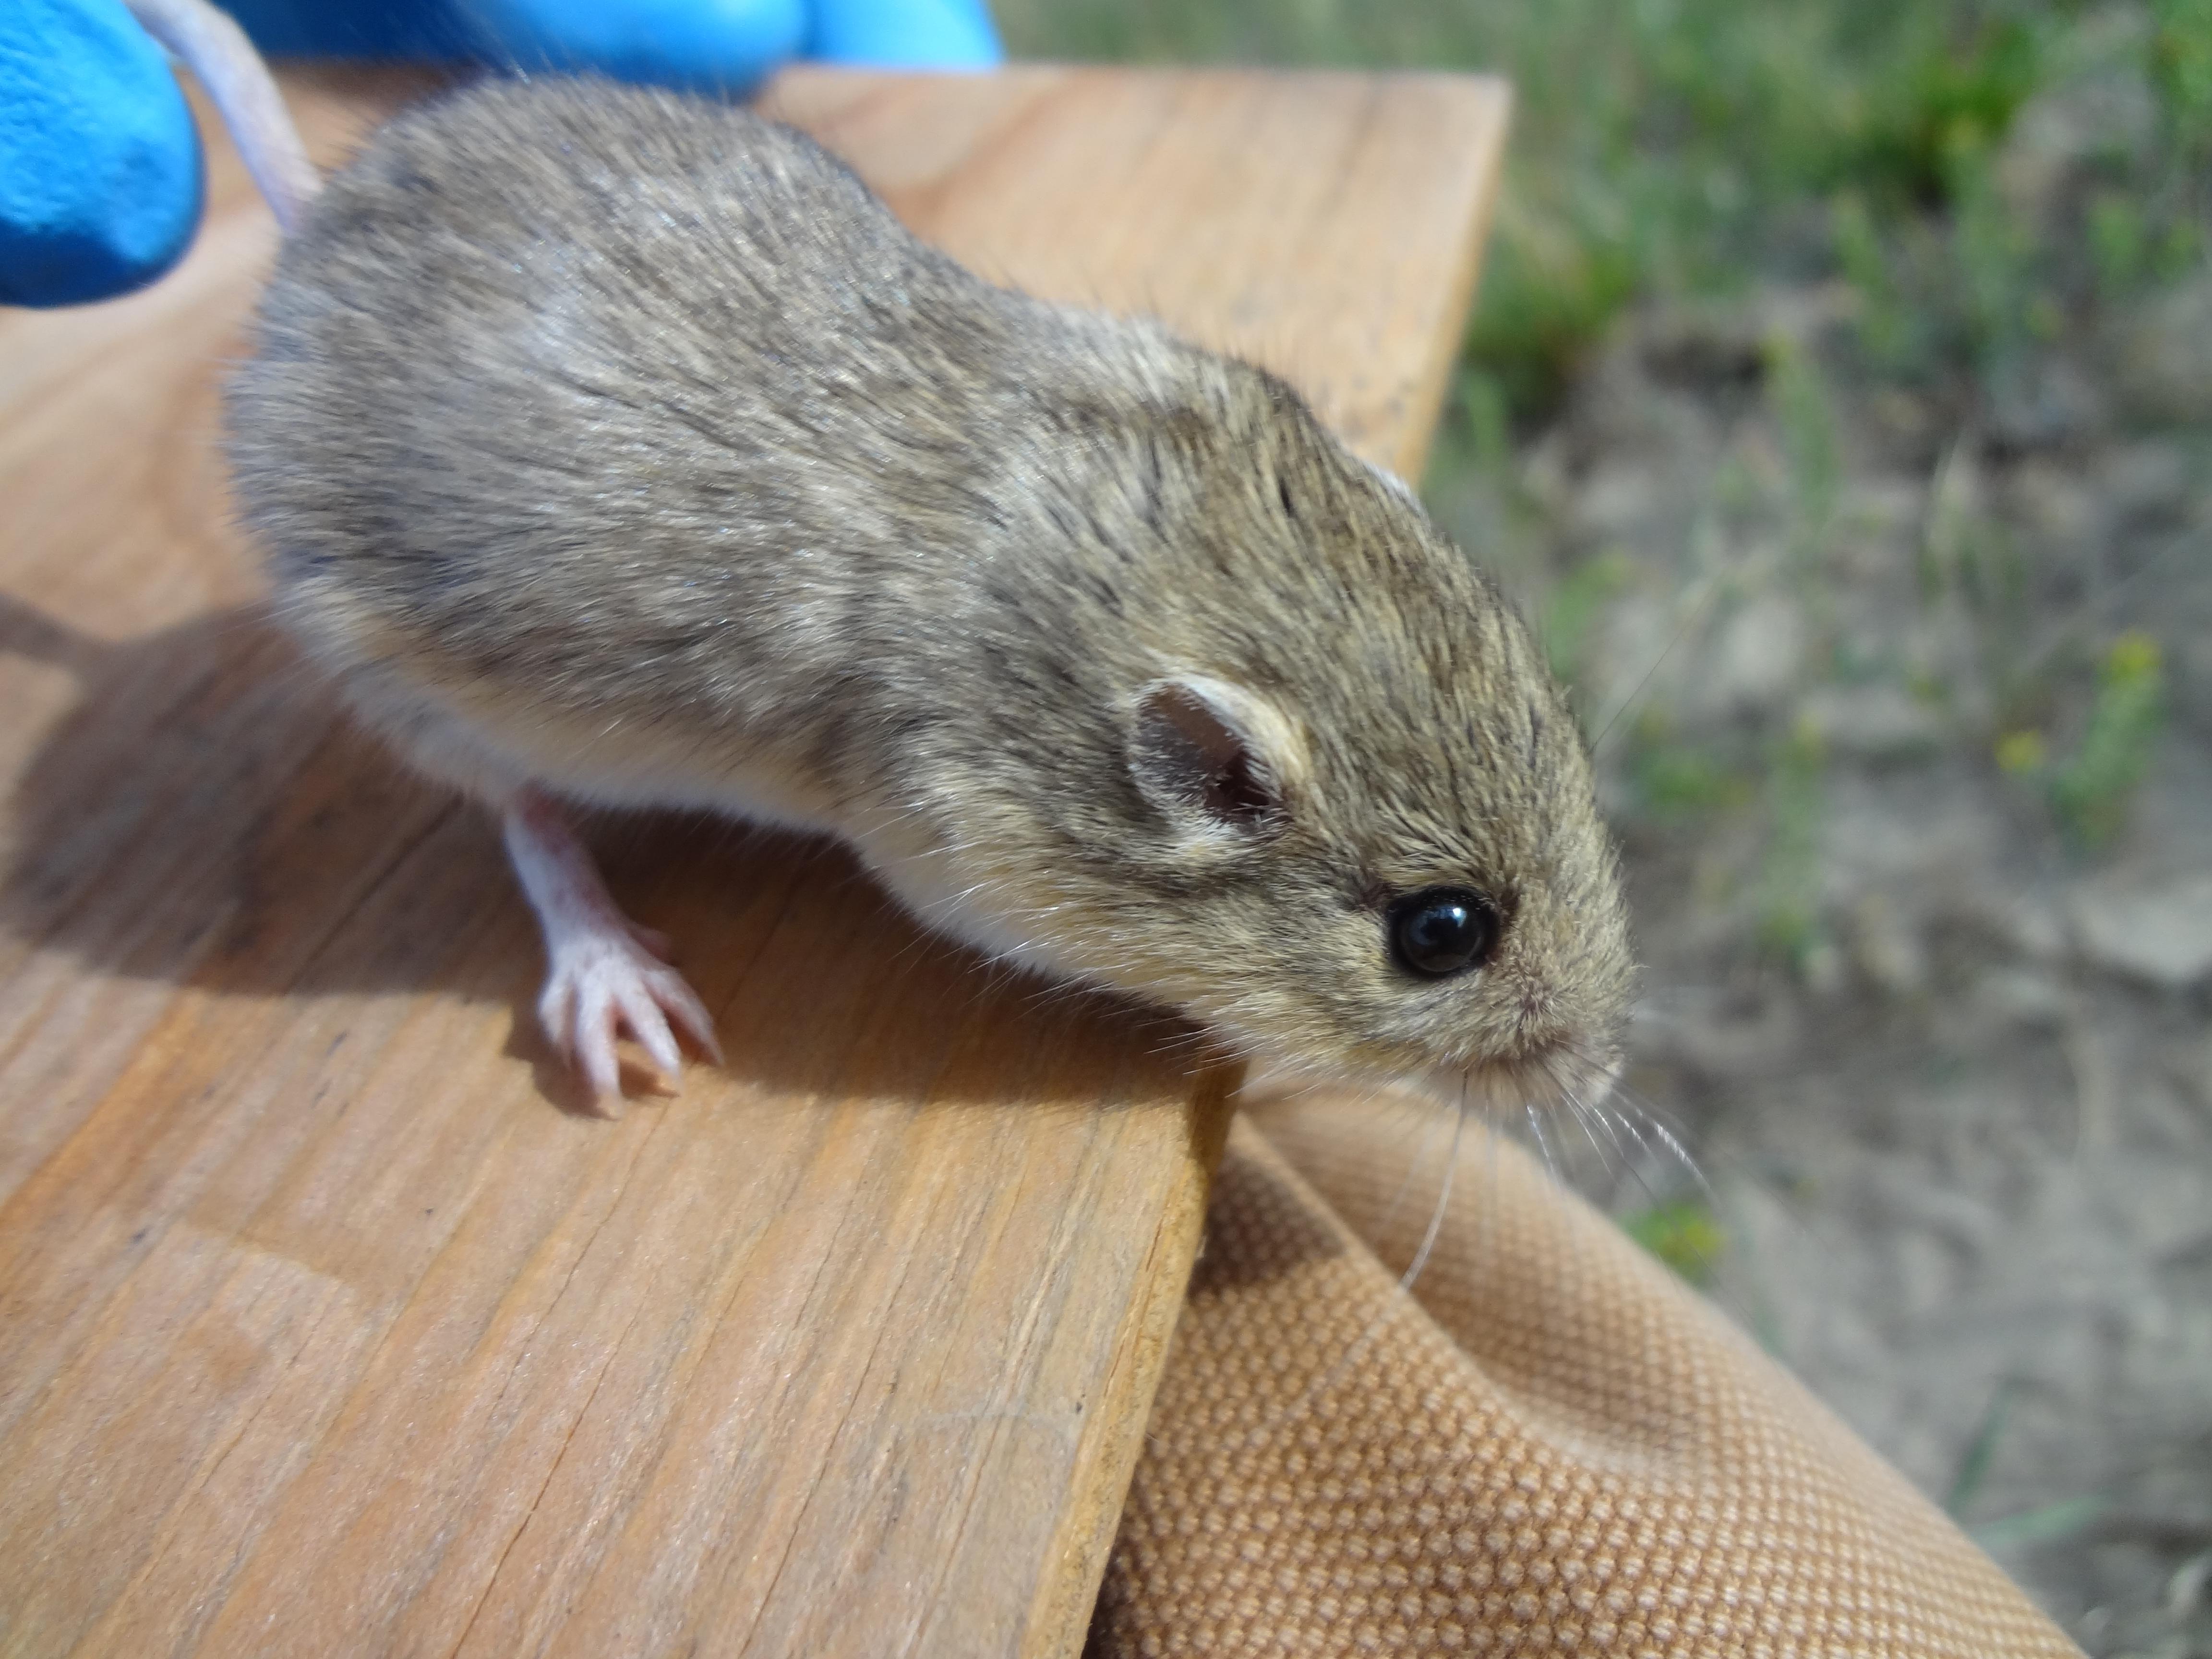 Pocket mouse, Thunder Basin National Grassland, WY